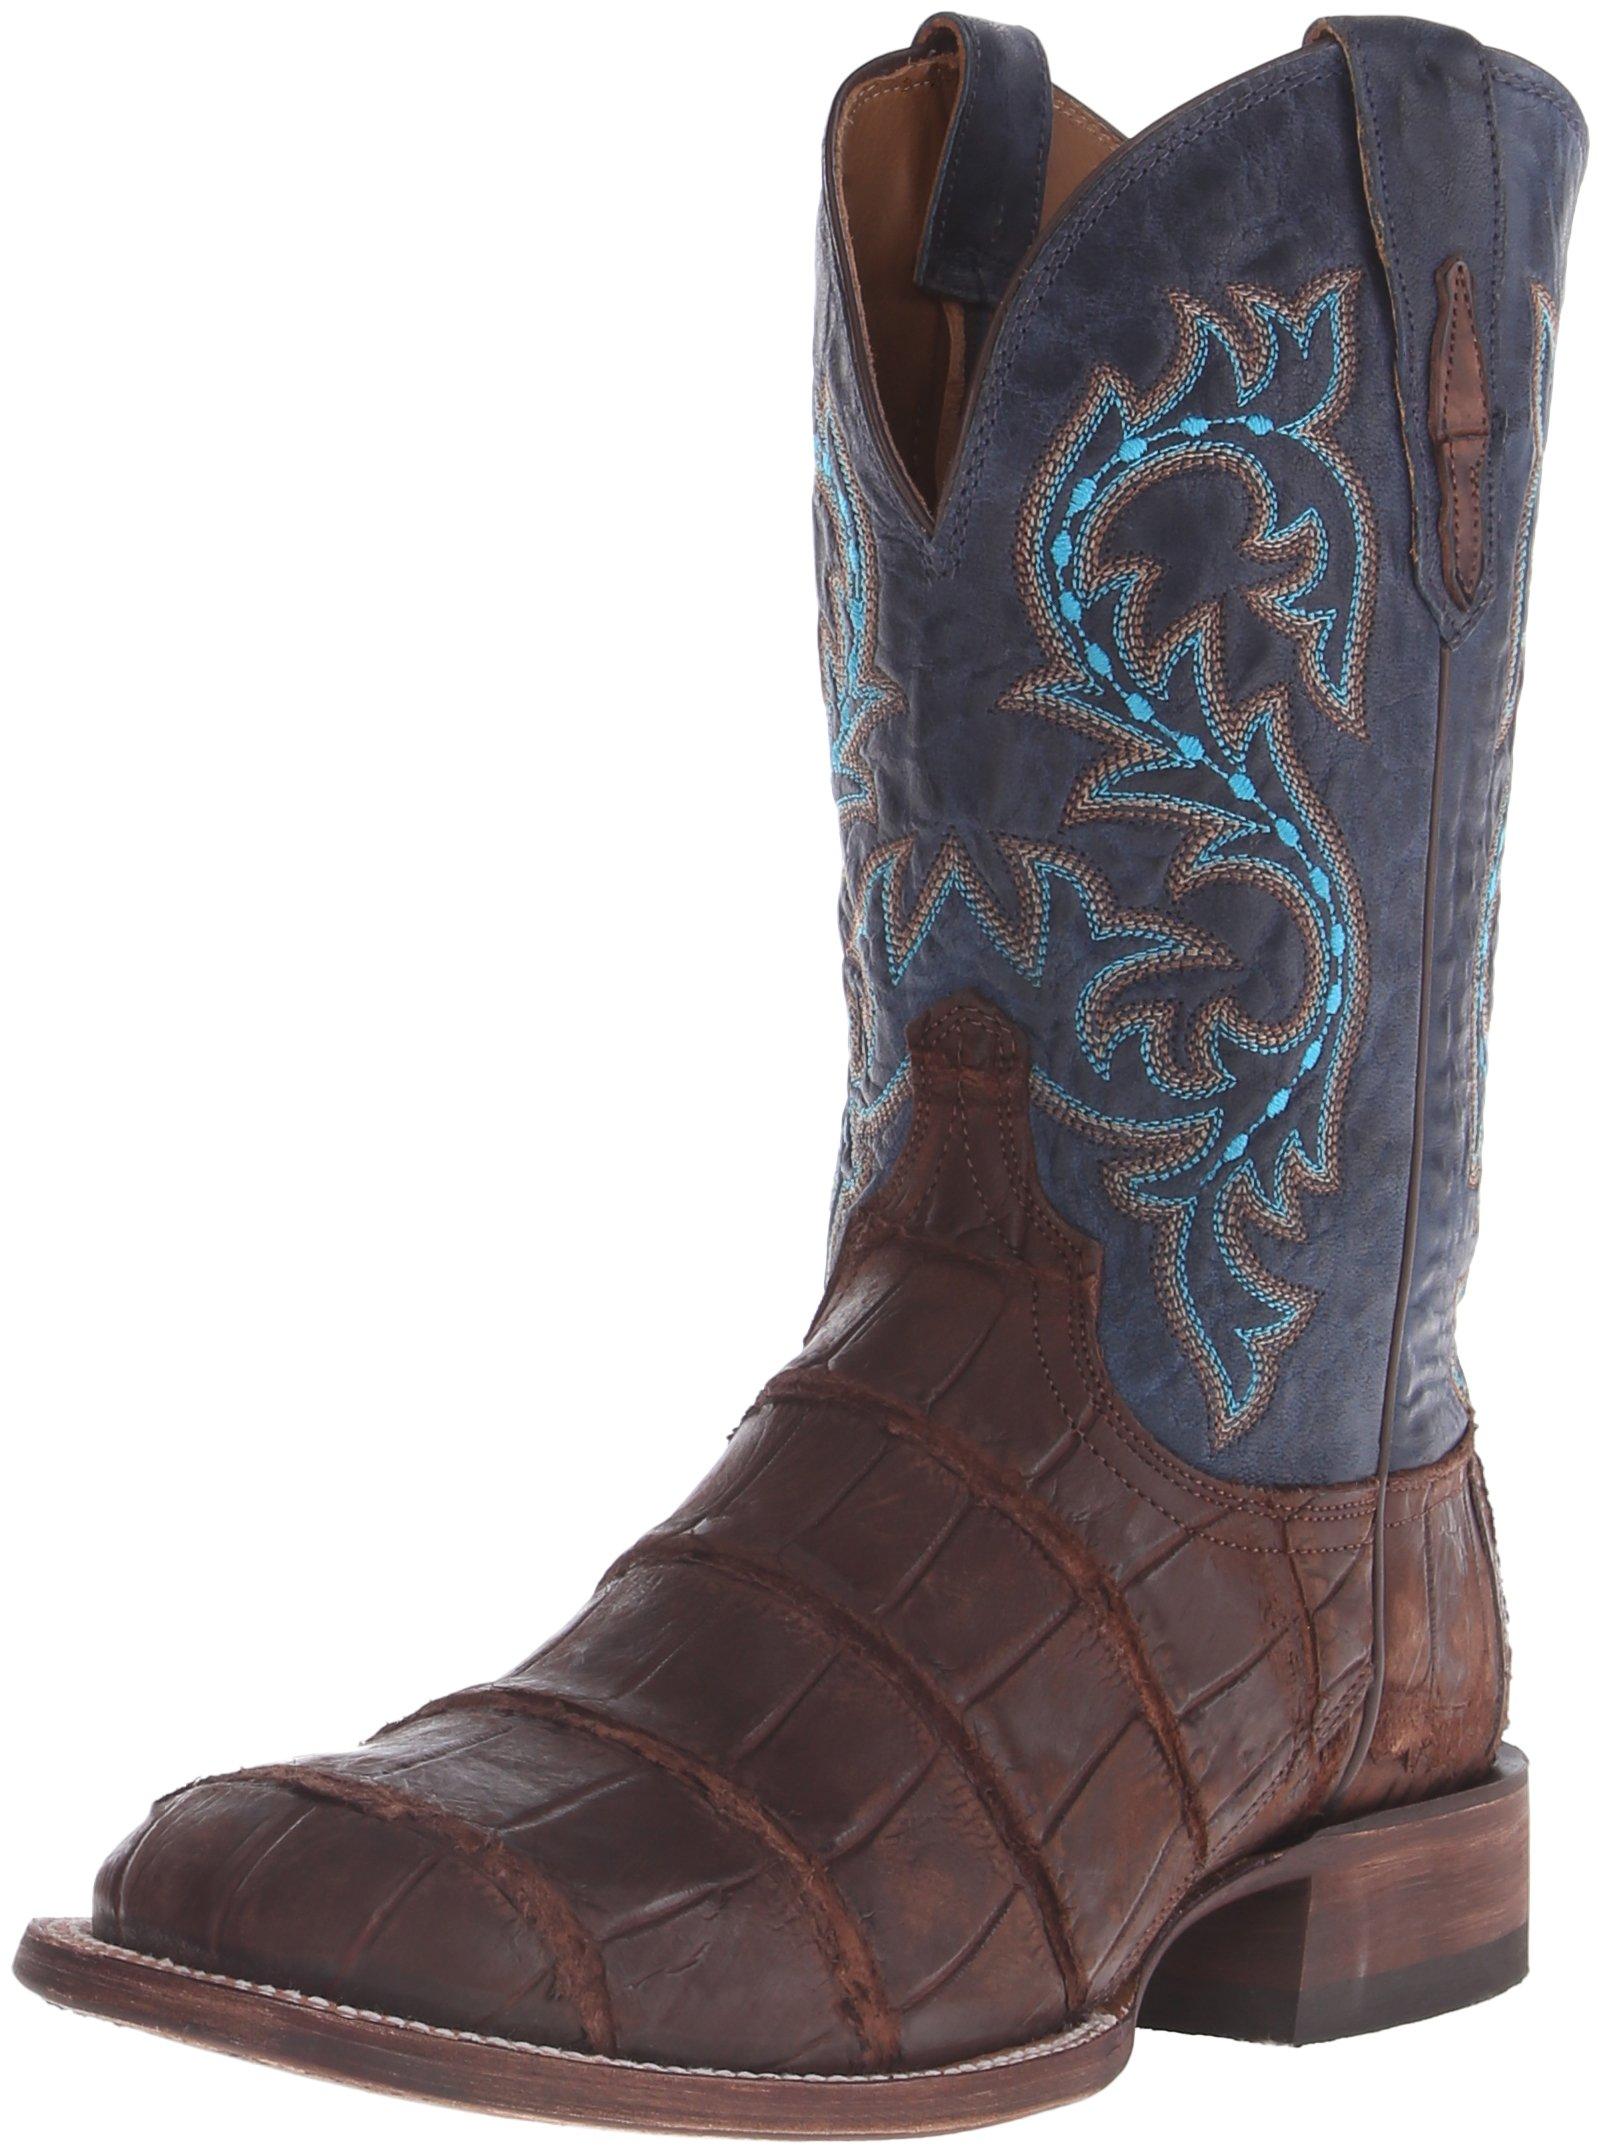 Lucchese Bootmaker Men's Malcom Western Boot Brandy 10 D US